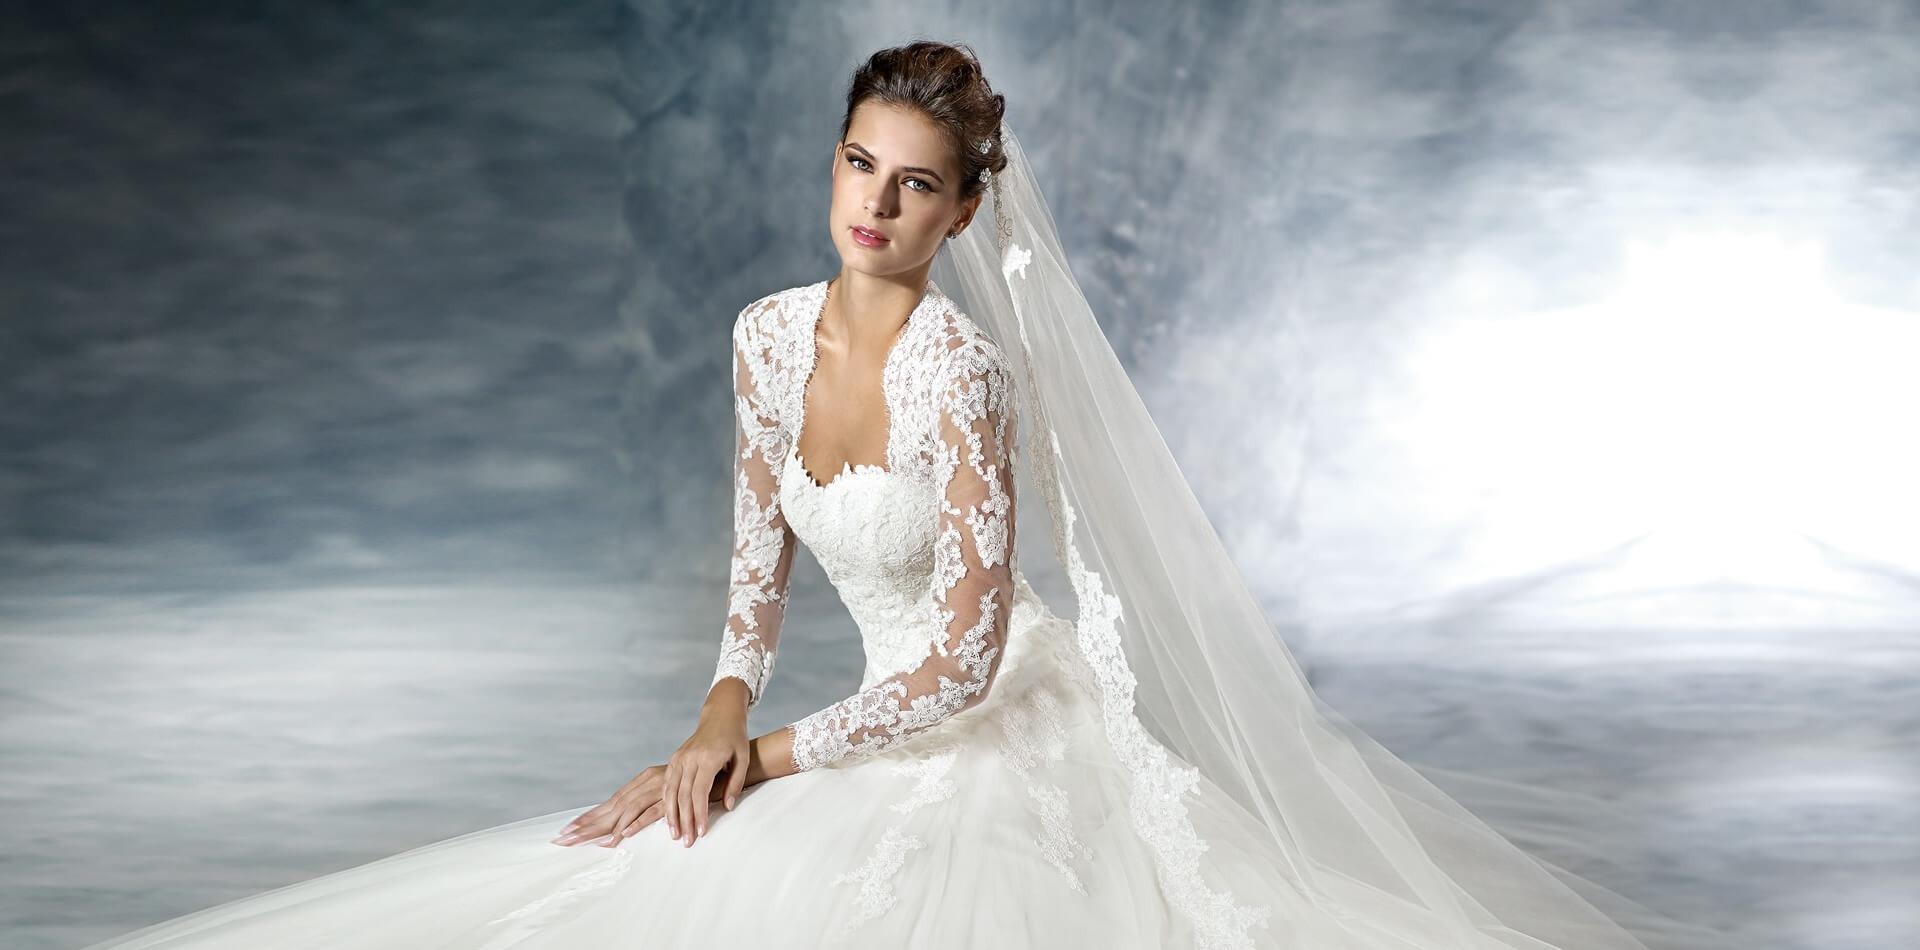 20 Genial Exklusive Brautmode Stylish20 Spektakulär Exklusive Brautmode Vertrieb